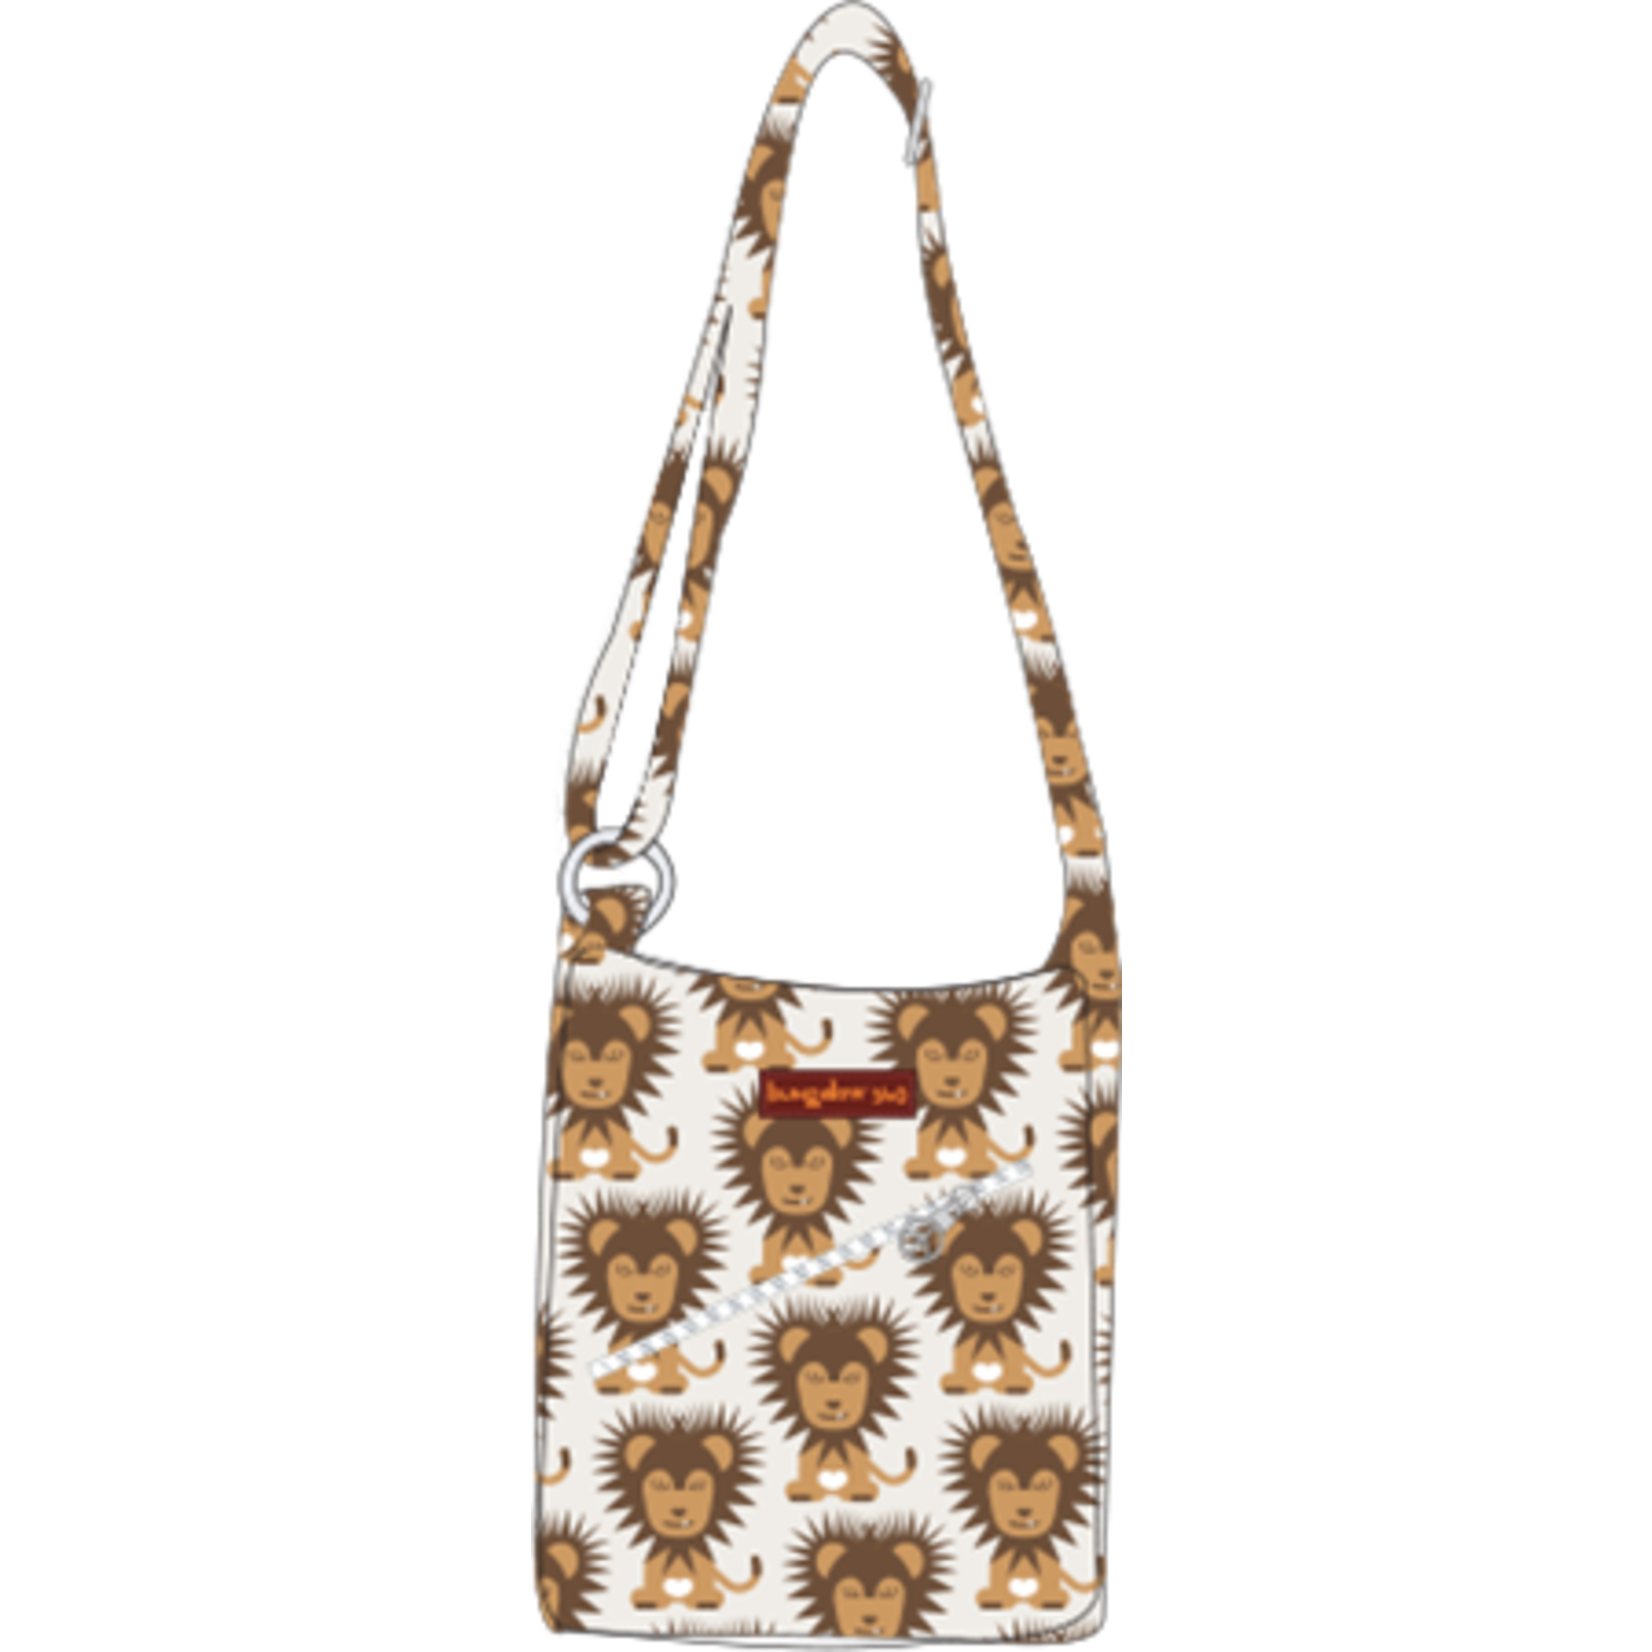 Bungalow 360 Small Messenger Bag - Lion